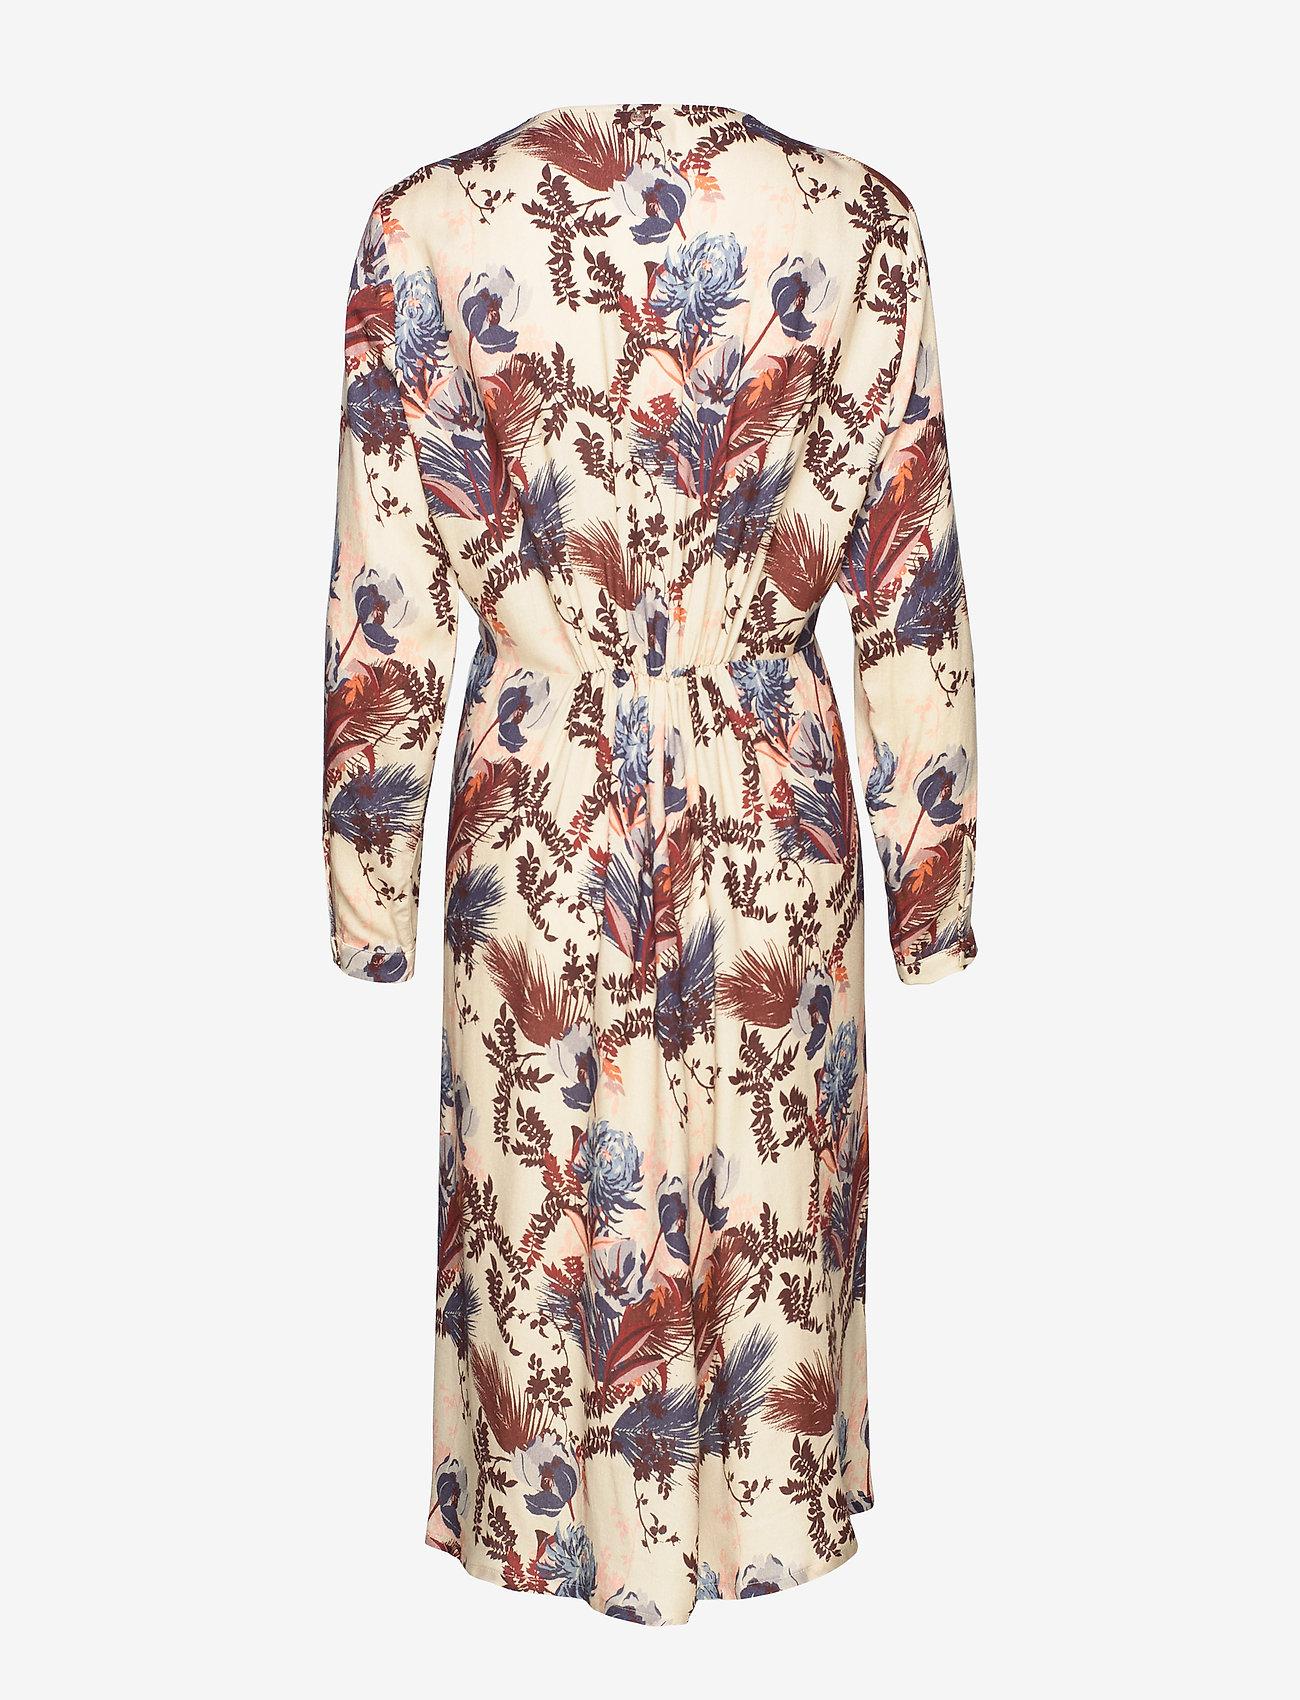 Ivy Beaux Dress (Wild Plum Flower) - MOS MOSH TRaDT8